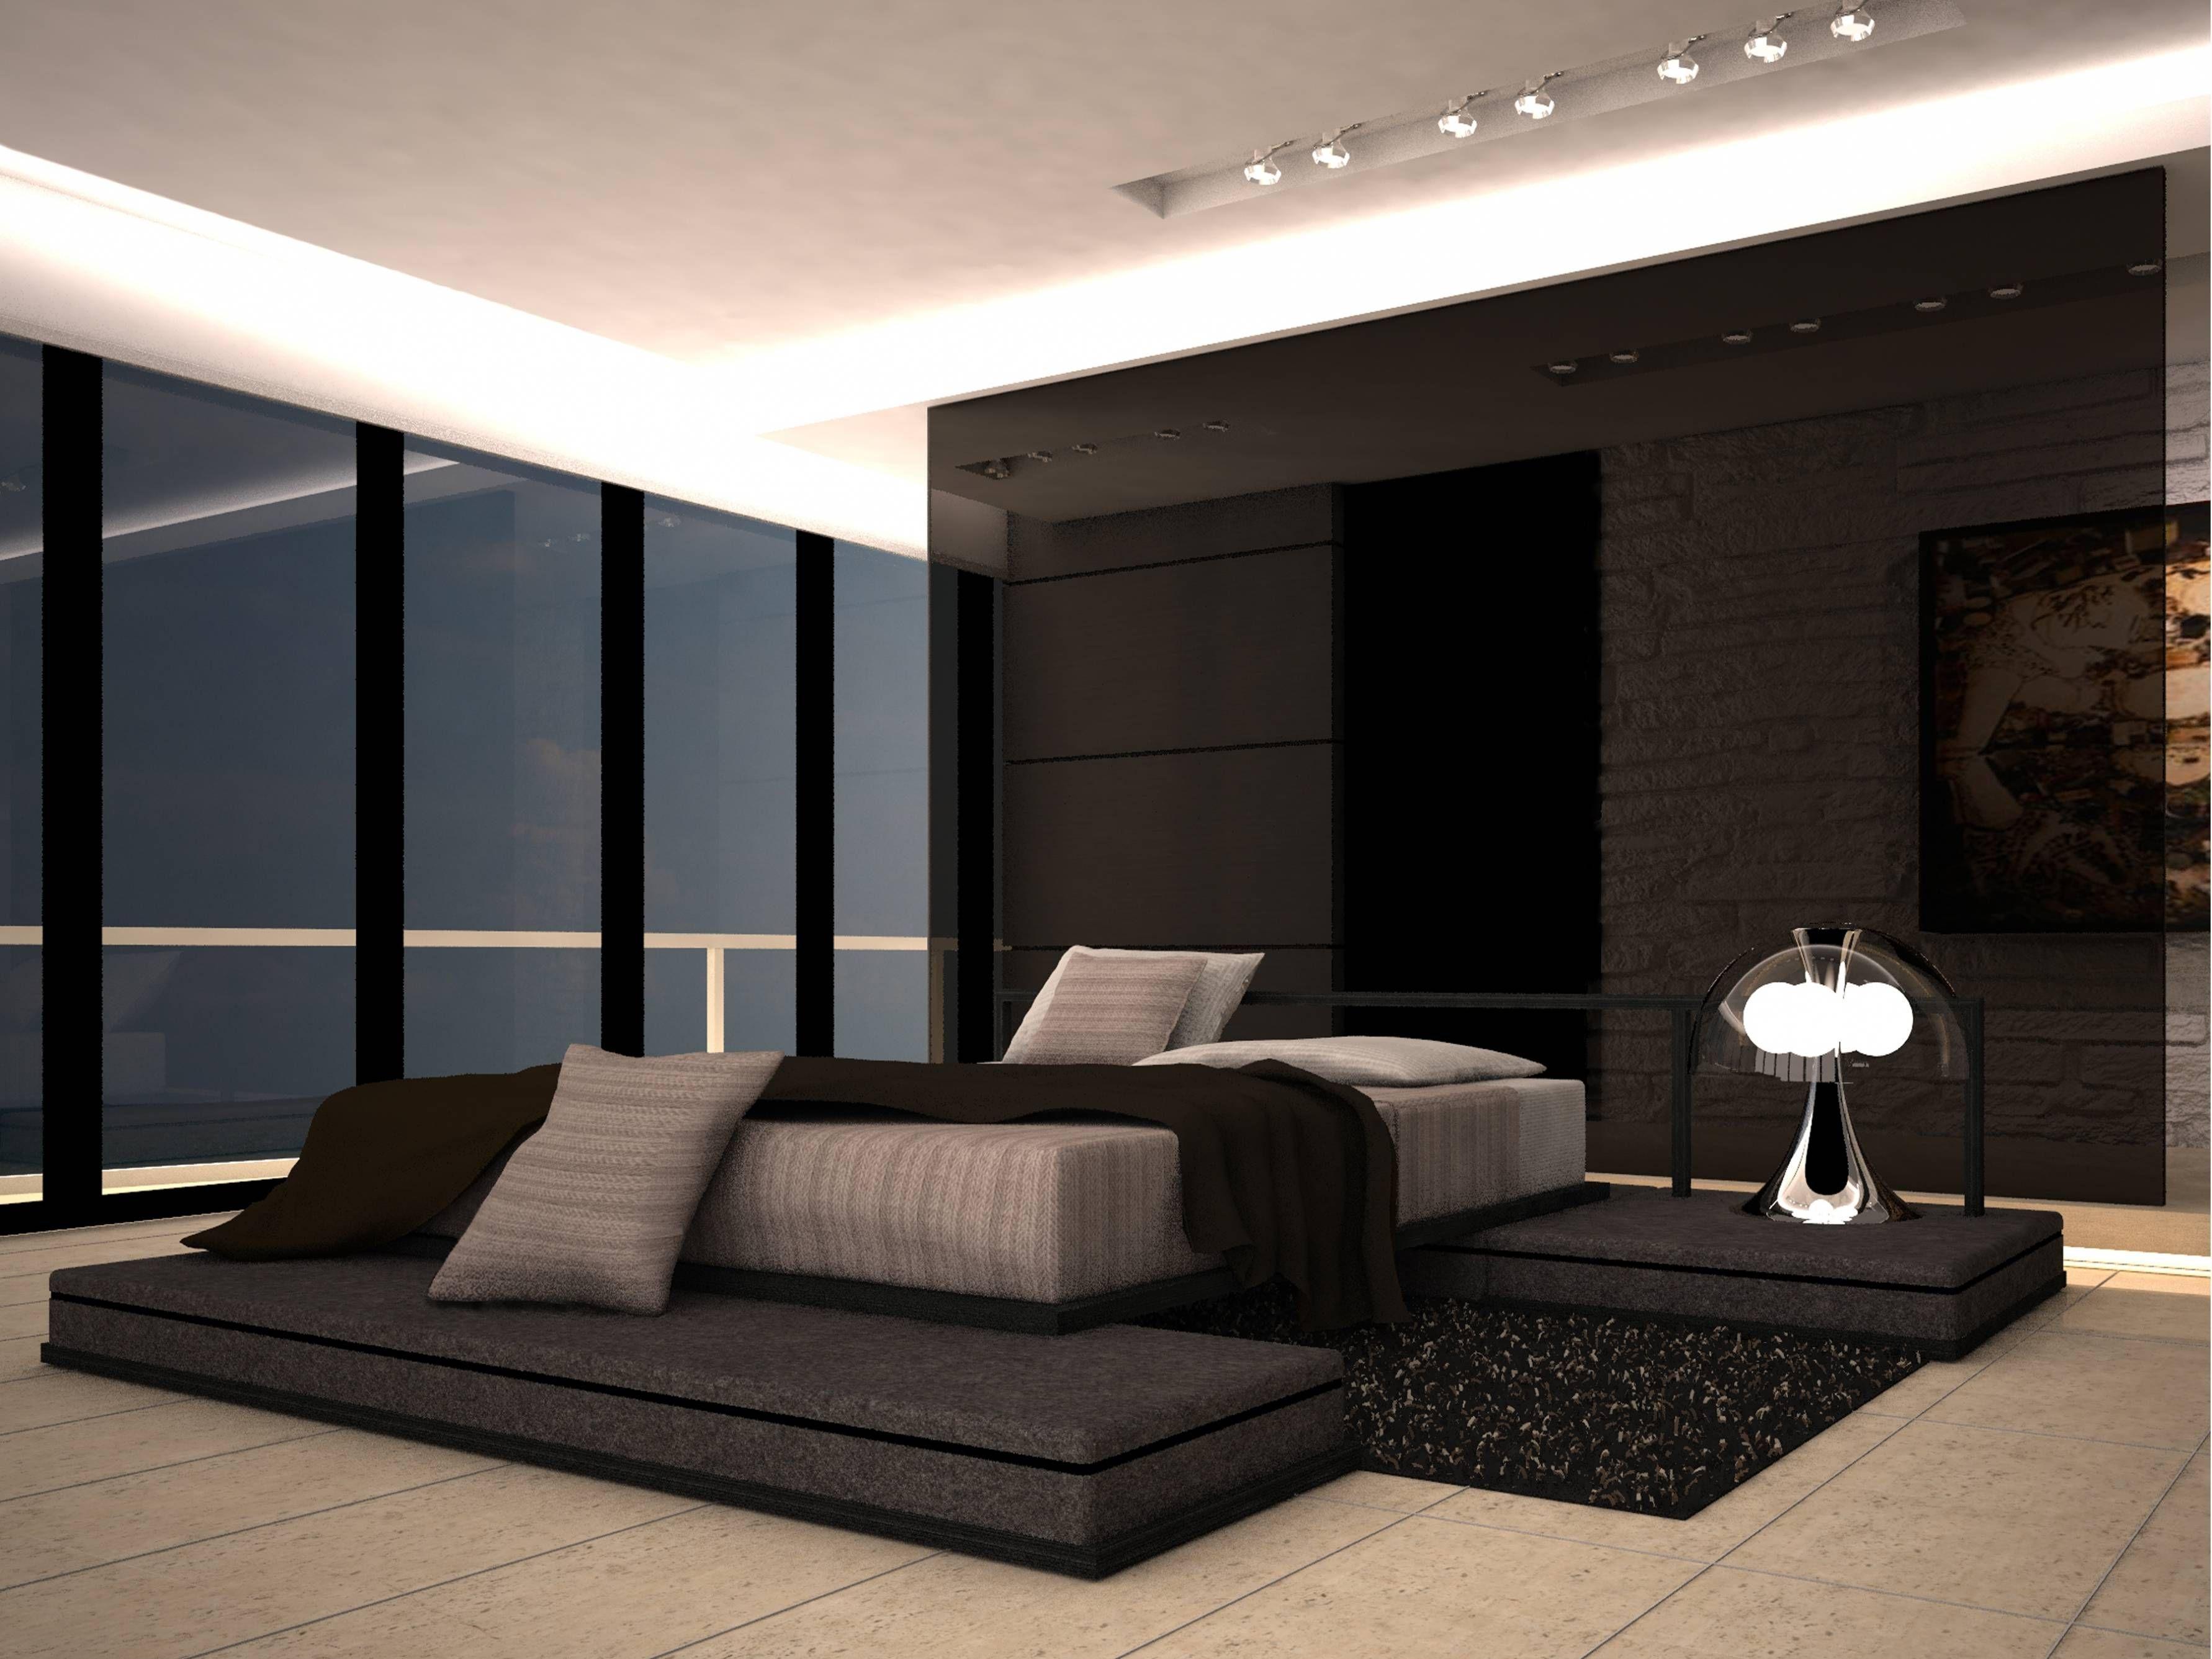 Futuristic Decorating Ideas For Bedroom Q Master Bedroom